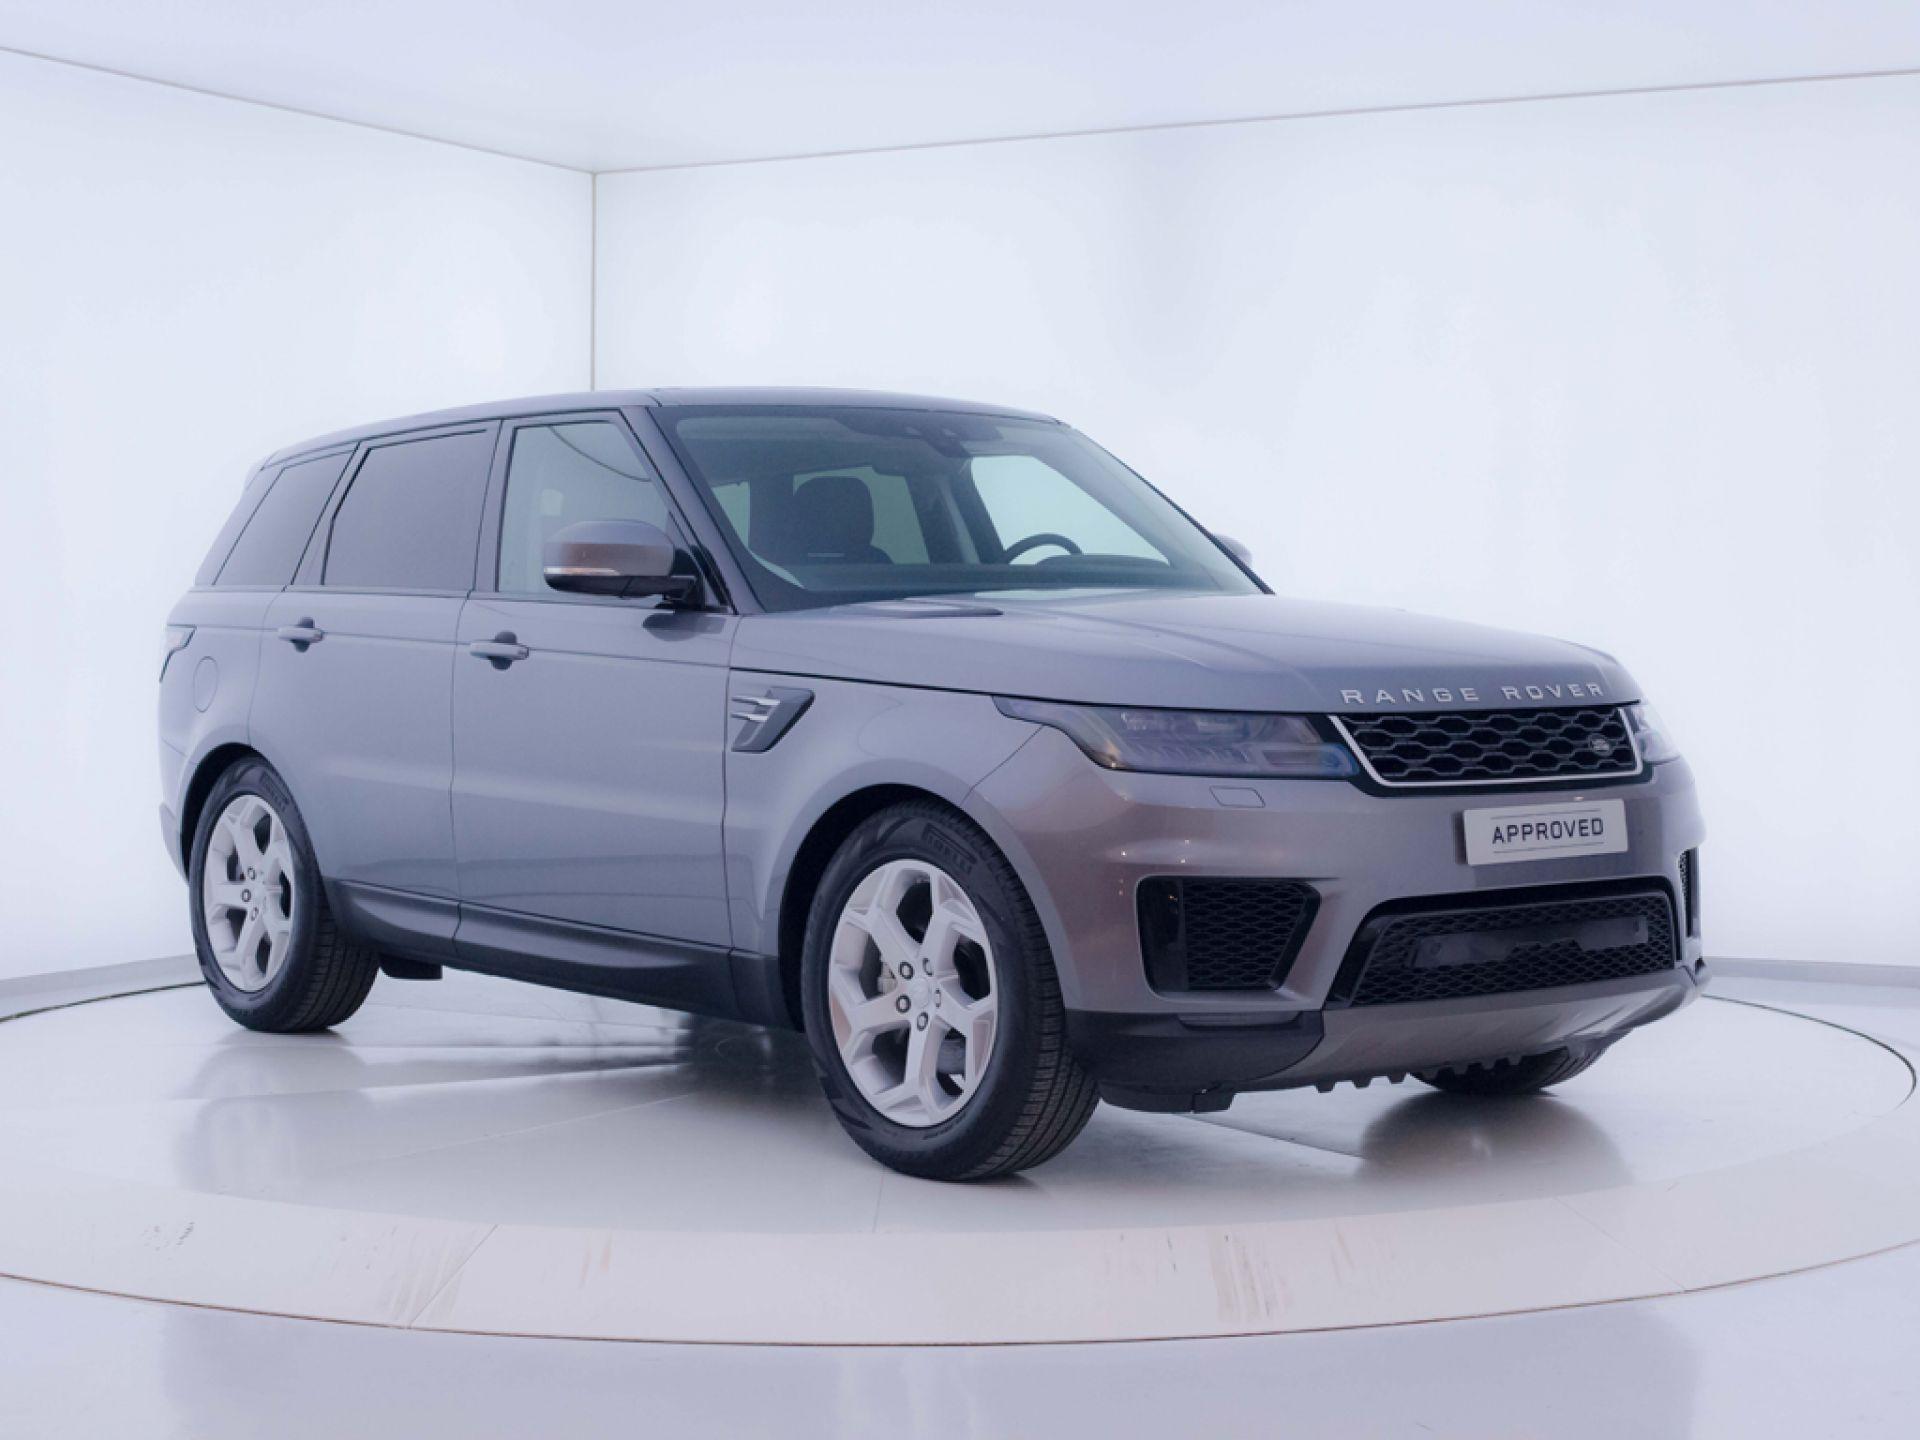 Land Rover Range Rover Sport 3.0 SDV6 183kW (249CV) S